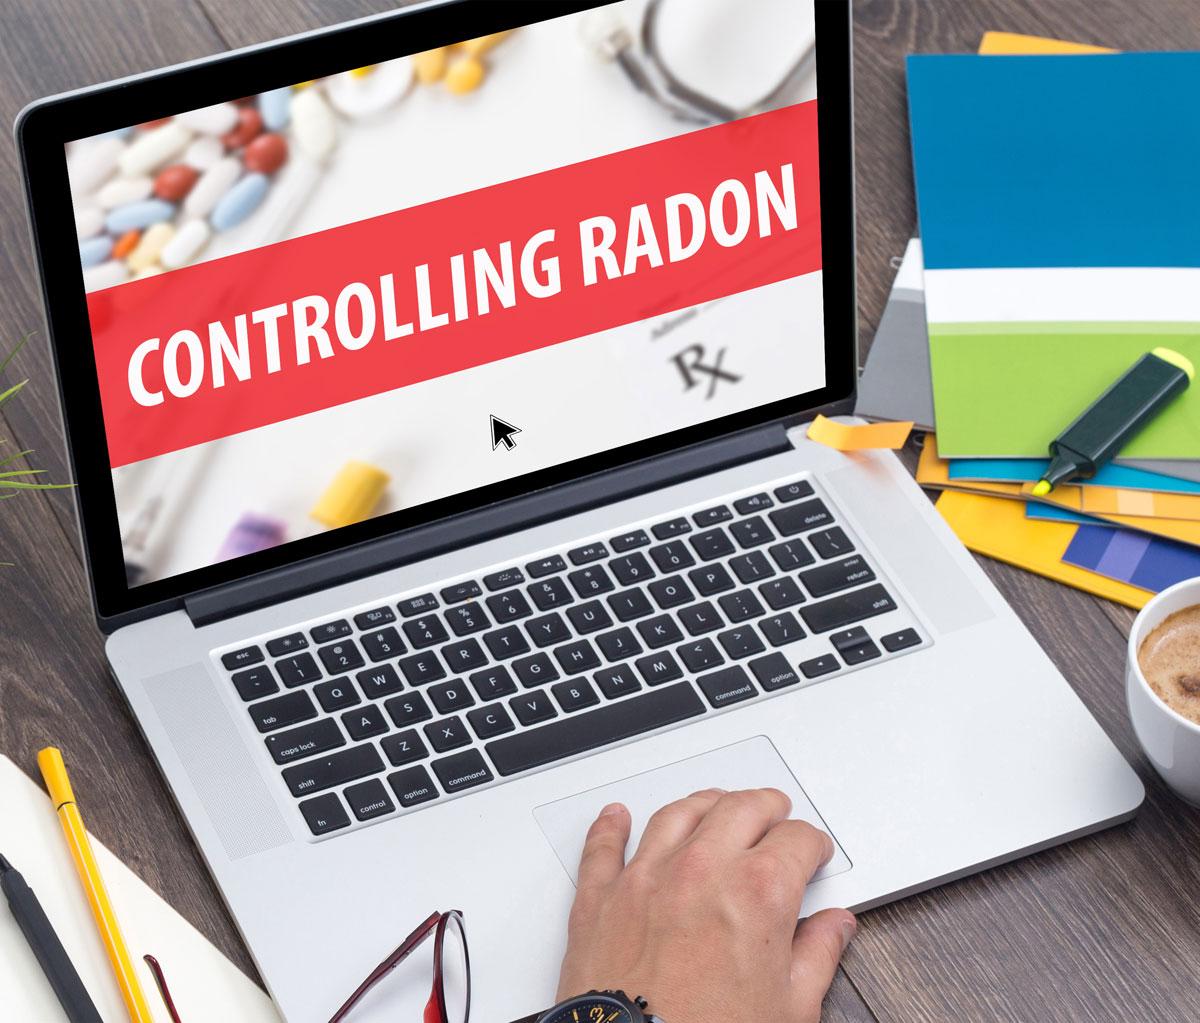 Controlling Radon